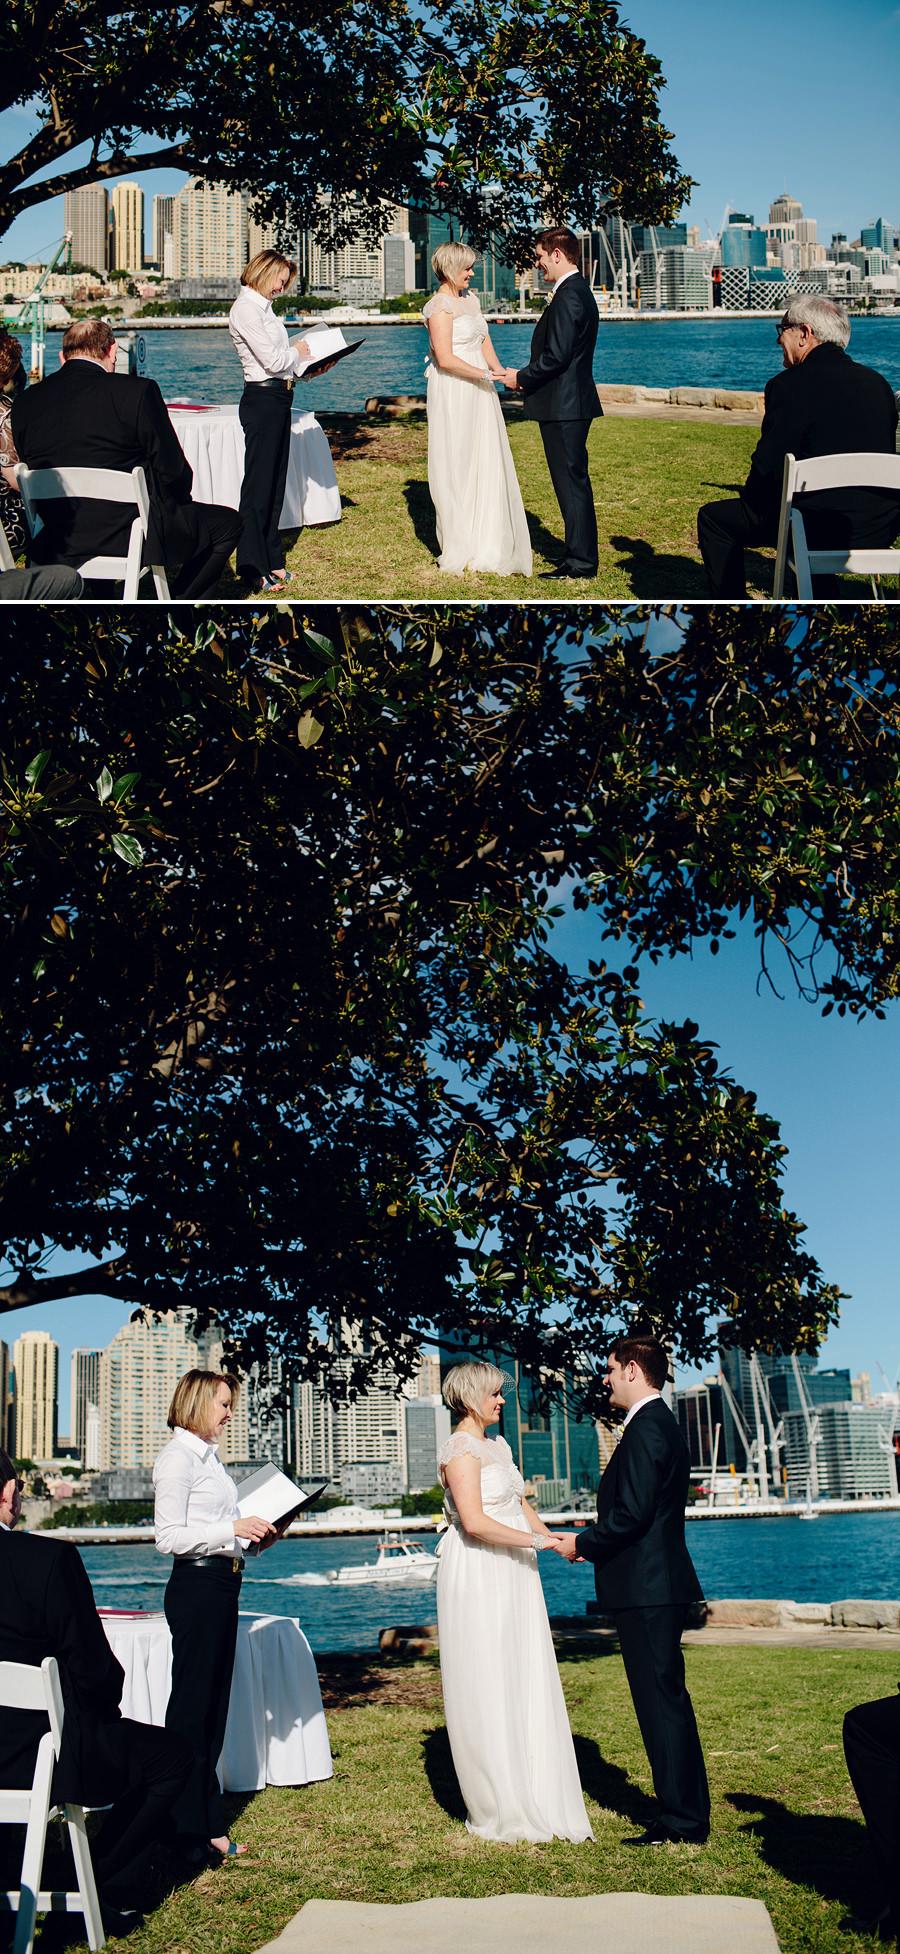 Balmain Wedding Photographer: Ceremony